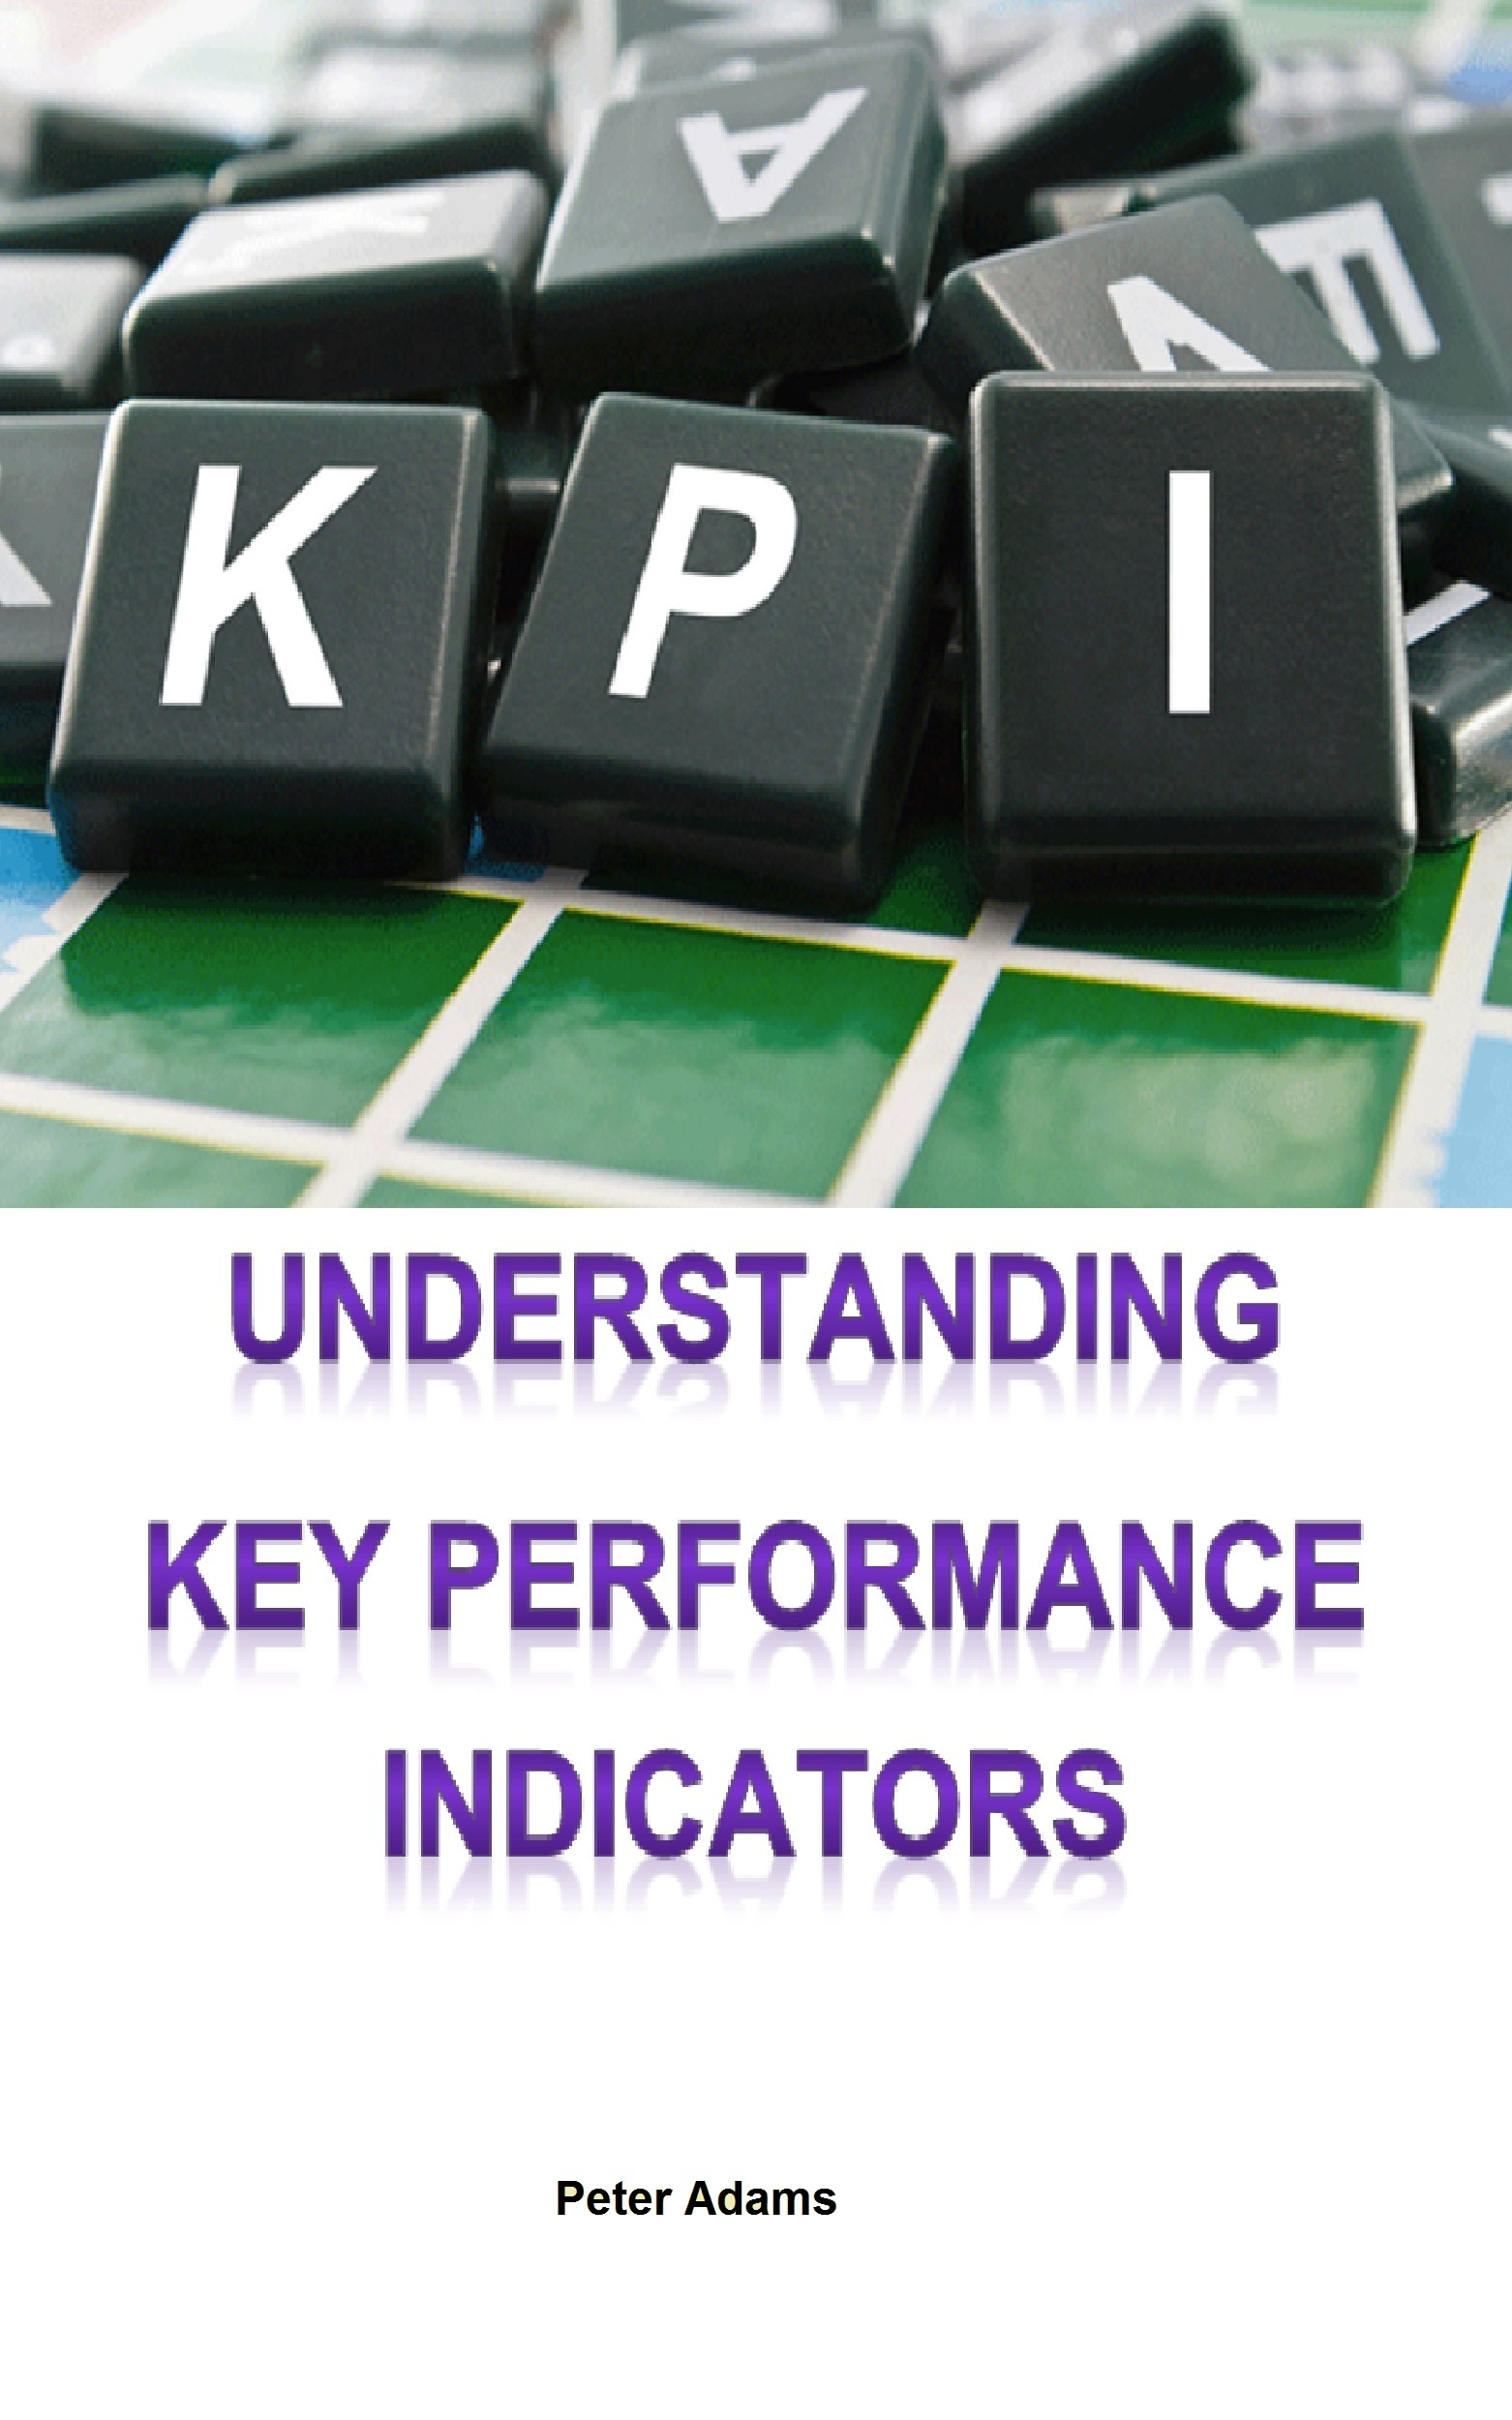 Understanding Key Performance Indicators Peter Adams